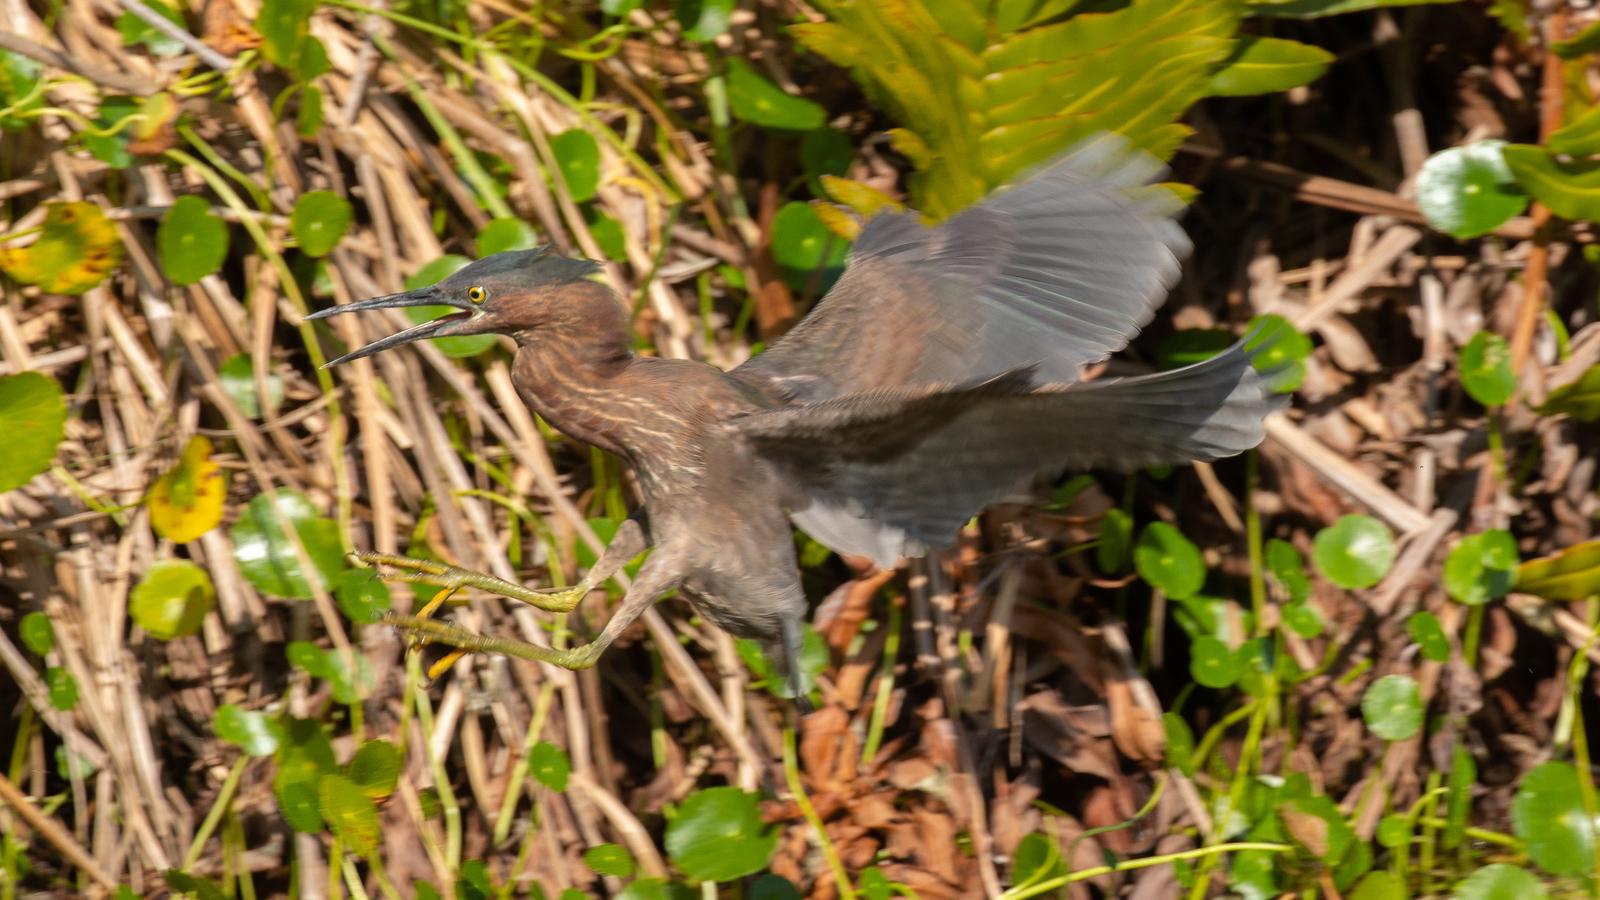 Photograph of flying Green Heron